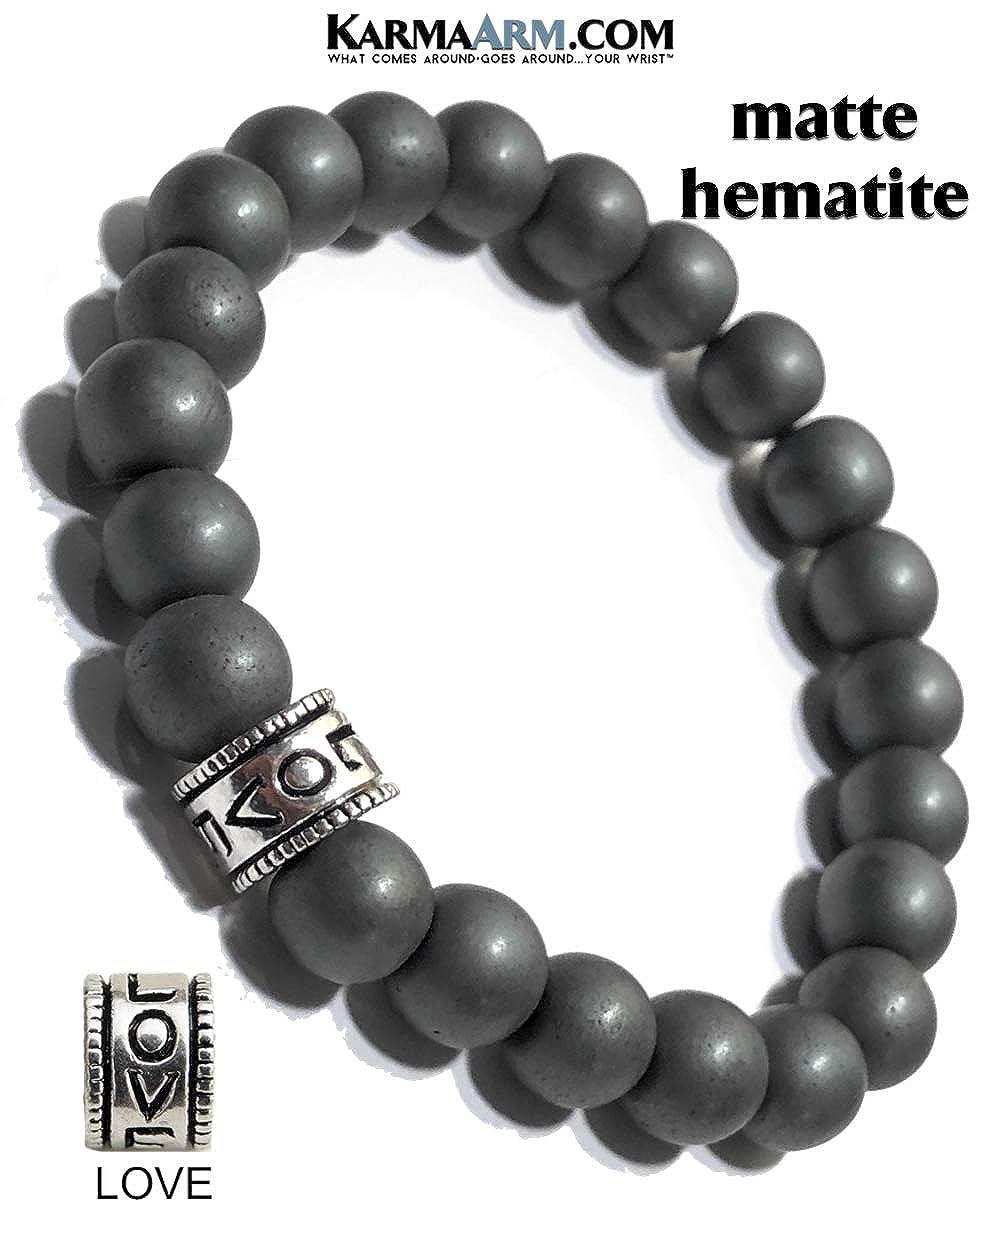 Anxiety Release: Matte Black Hematite Boho Zen Meditation Jewelry KarmaArm Love Bracelet Love Bead Yoga Chakra Reiki Healing Energy Bracelet